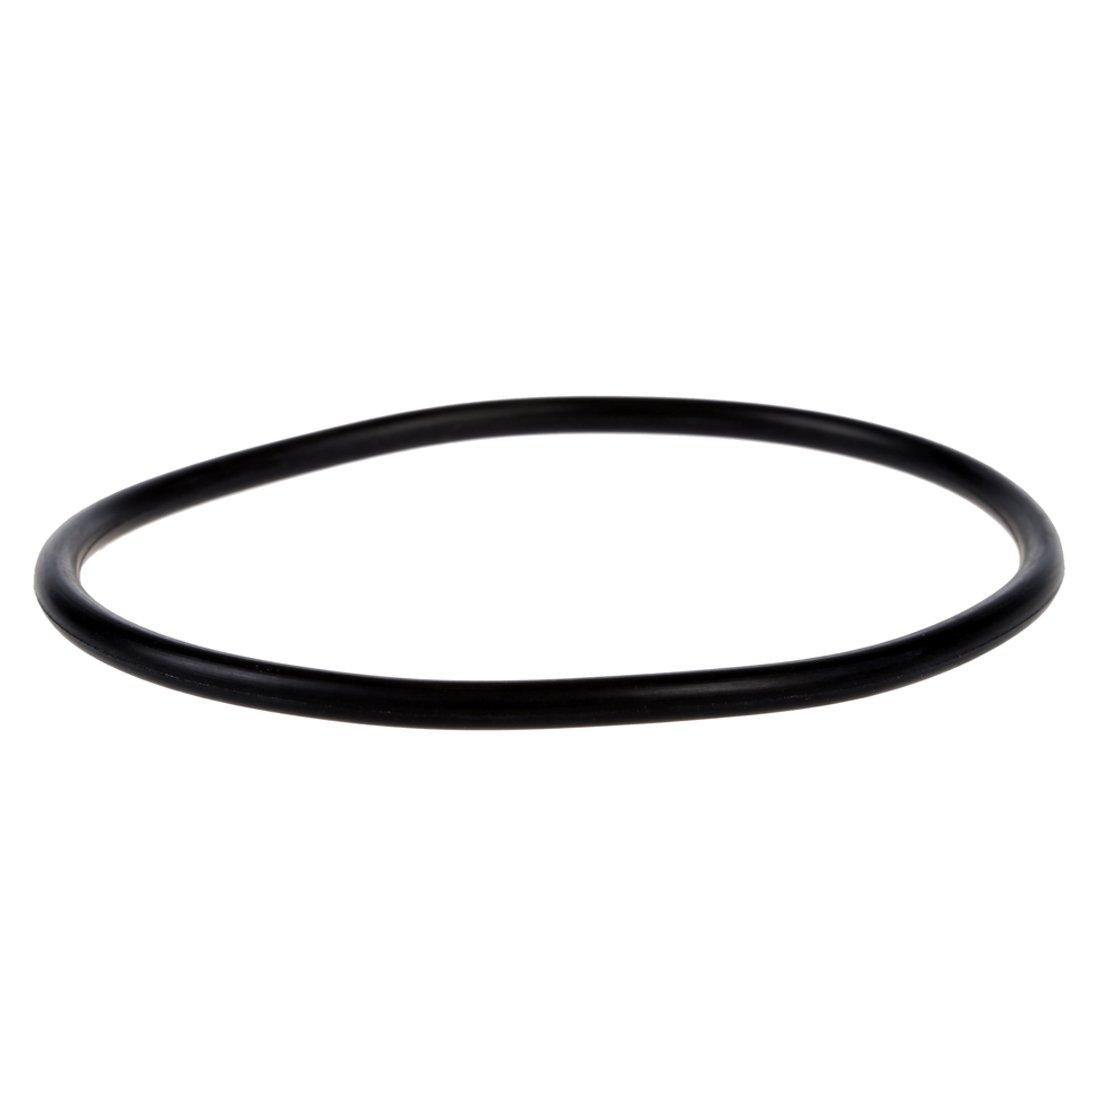 WOVELOT 10 Stk 110mm x 5 mm Nitril schwarz O Ring NBR Dichtung Gummidichtung